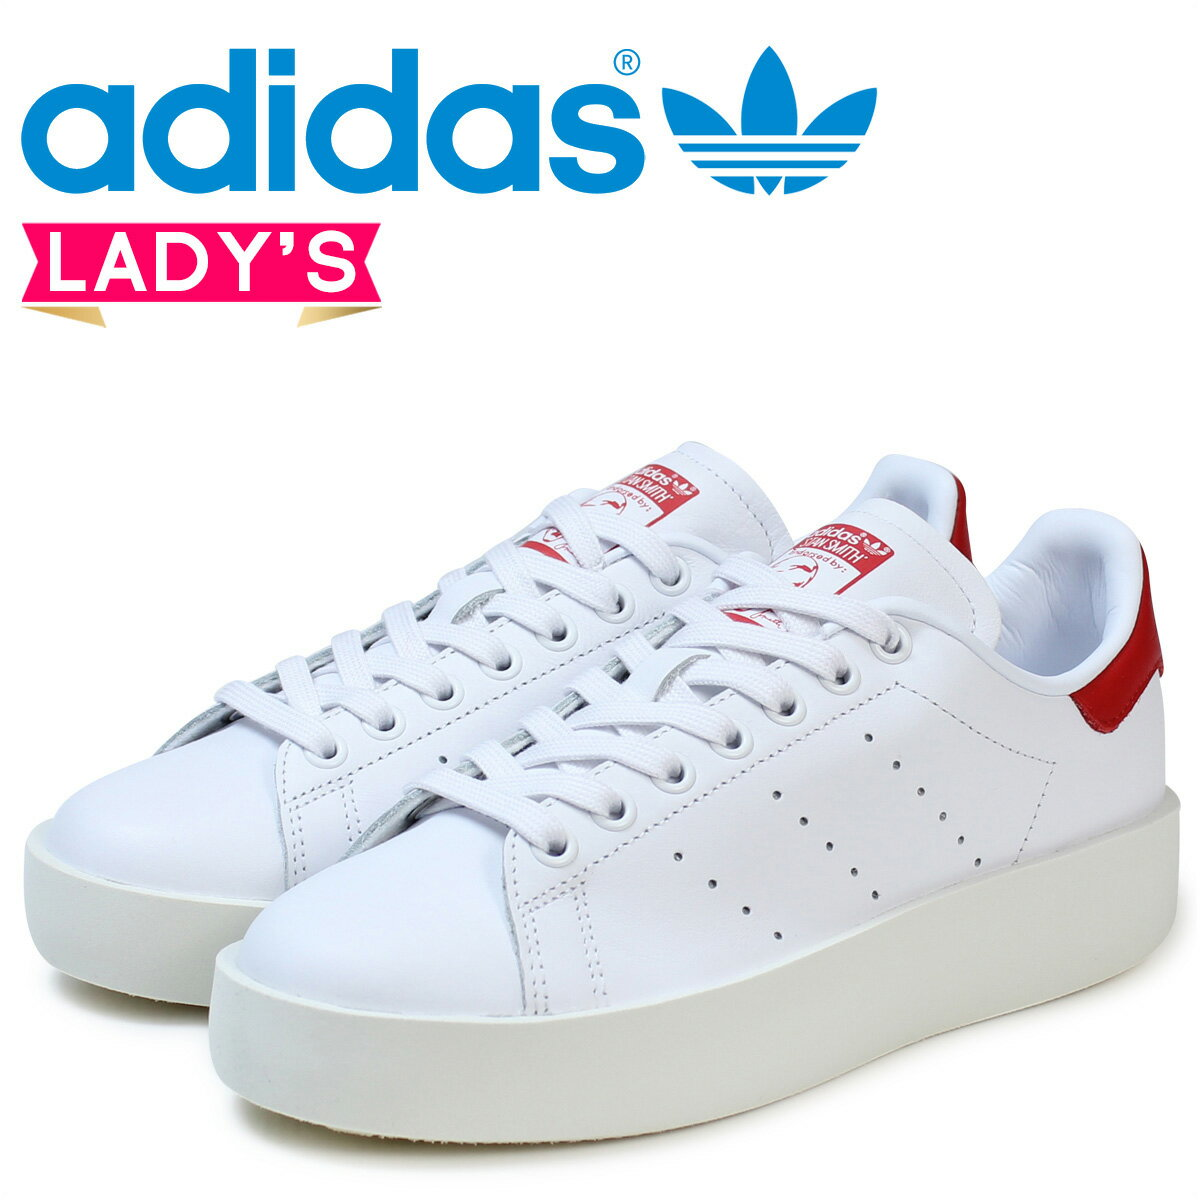 adidas スタンスミス レディース スニーカー アディダス Originals STAN SMITH BD W S32267 靴 ホワイト オリジナルス